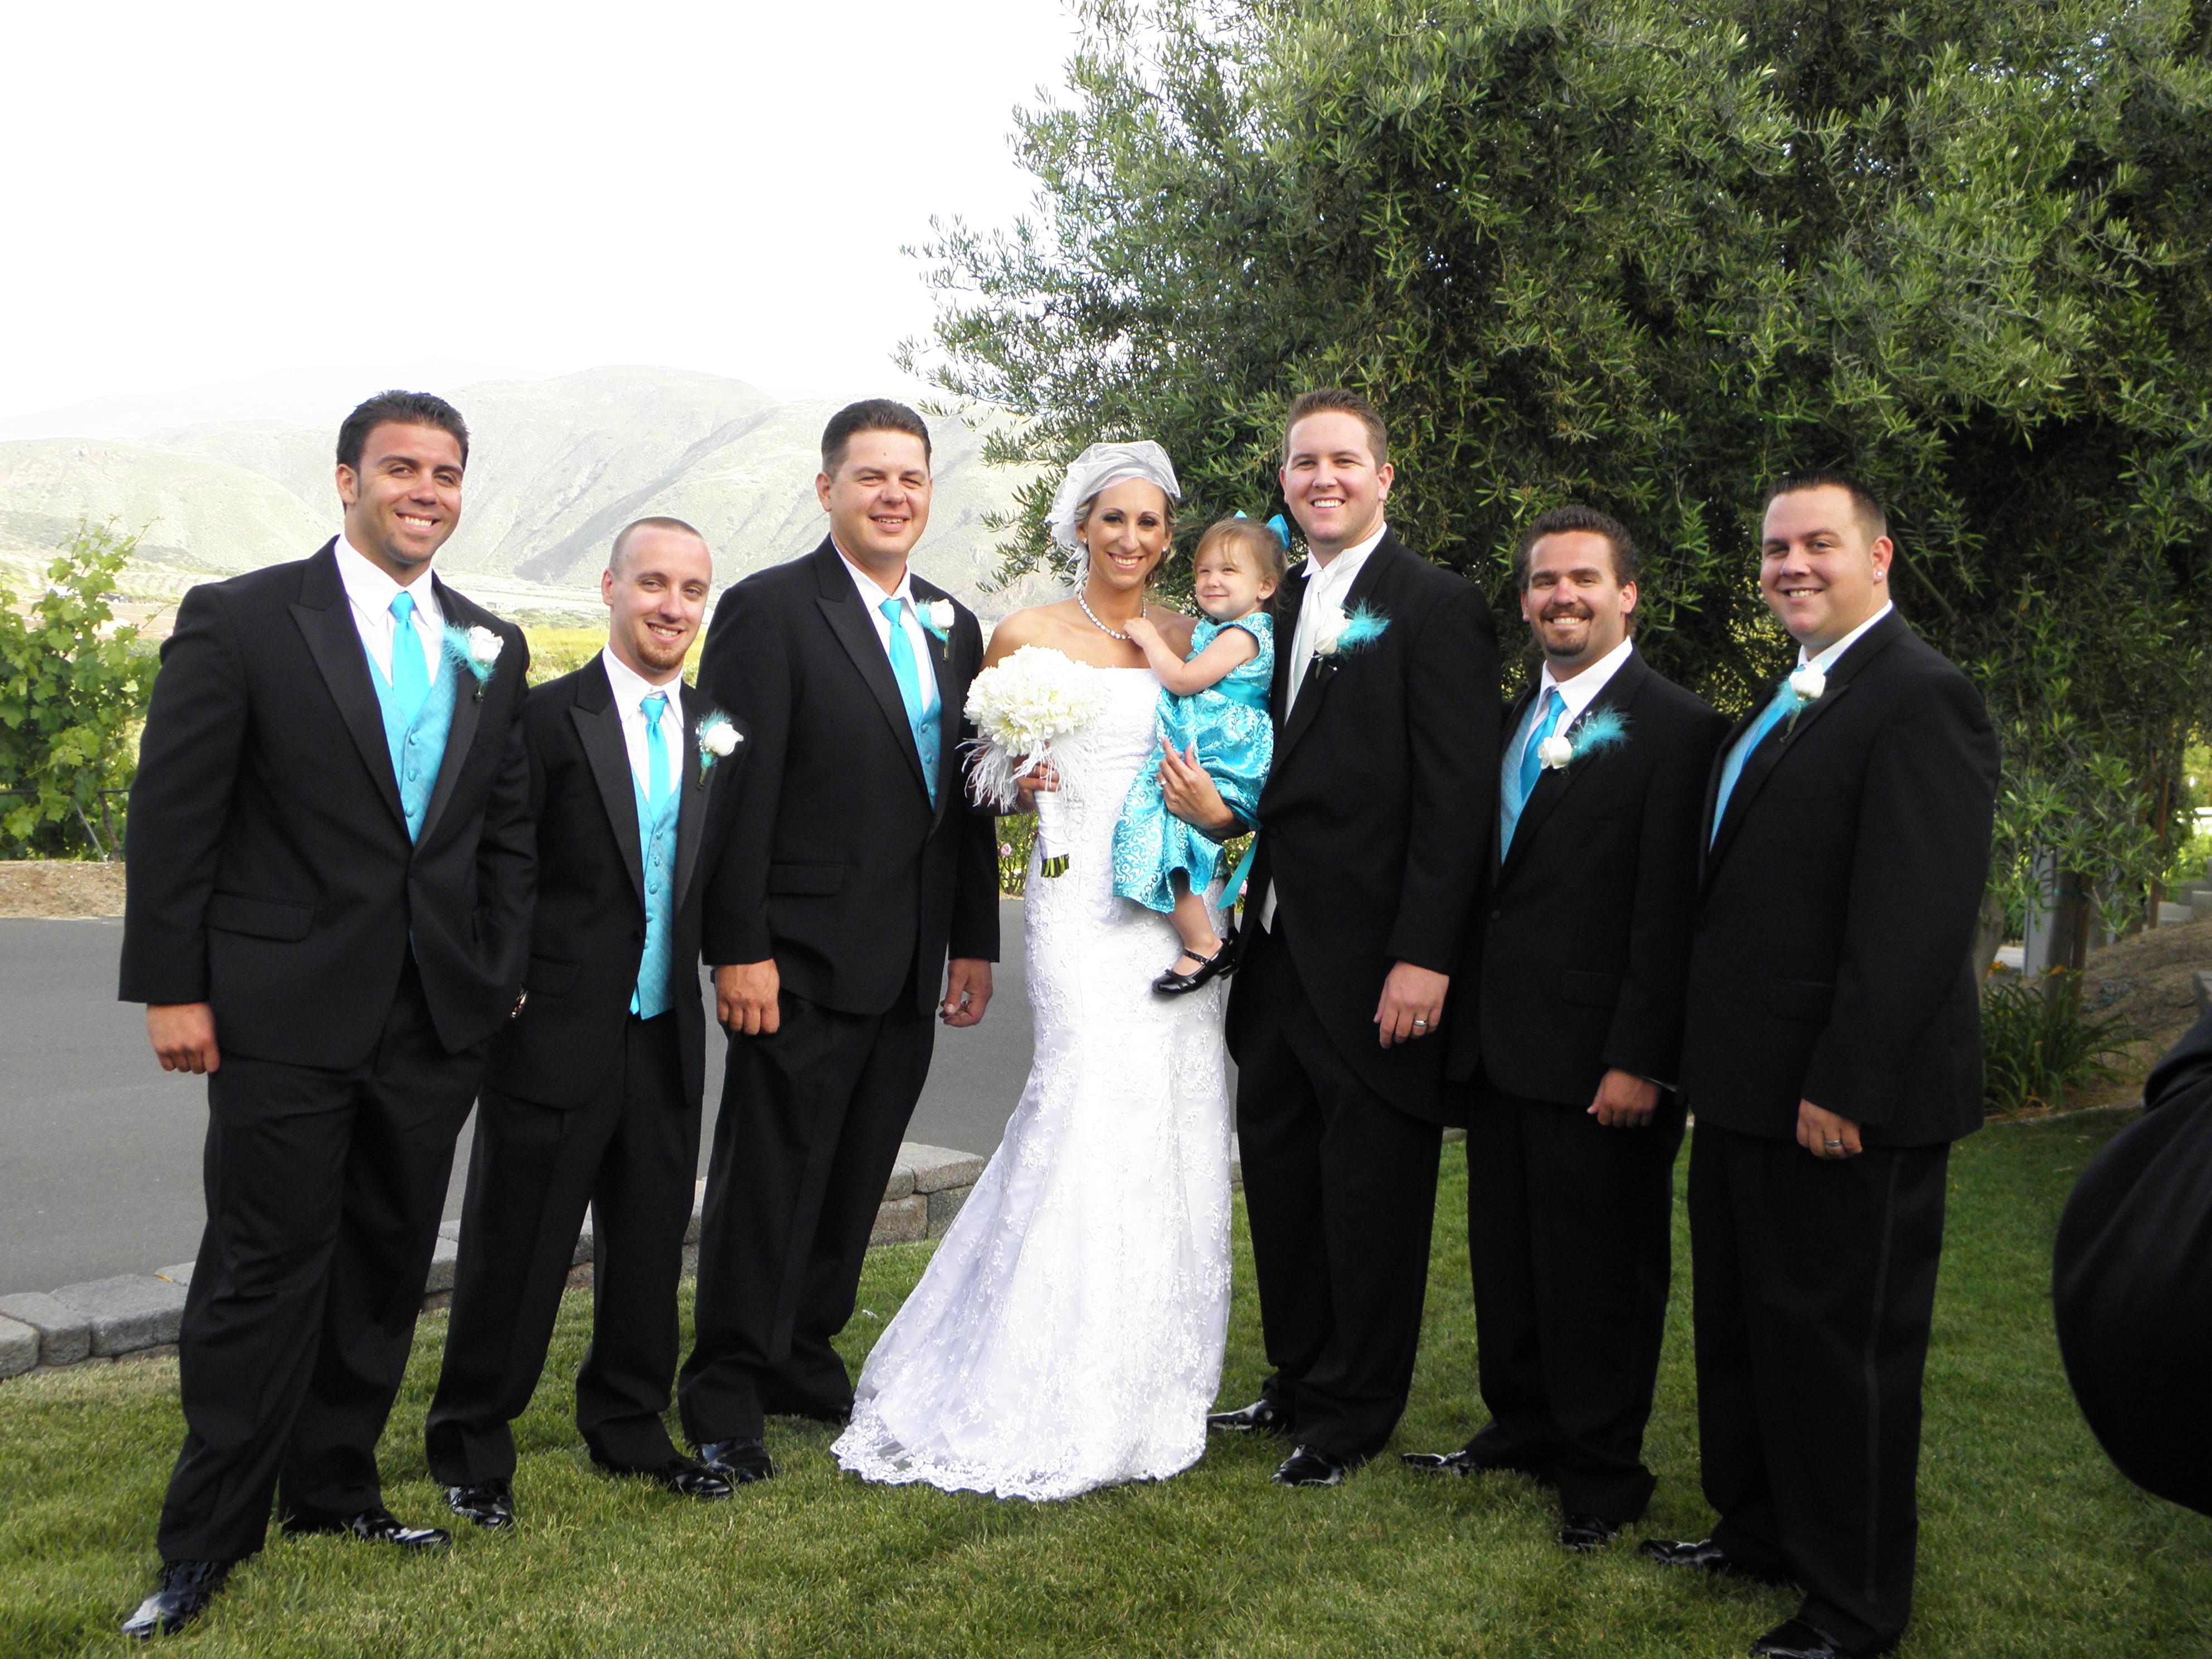 South Coast Wedding Officiant